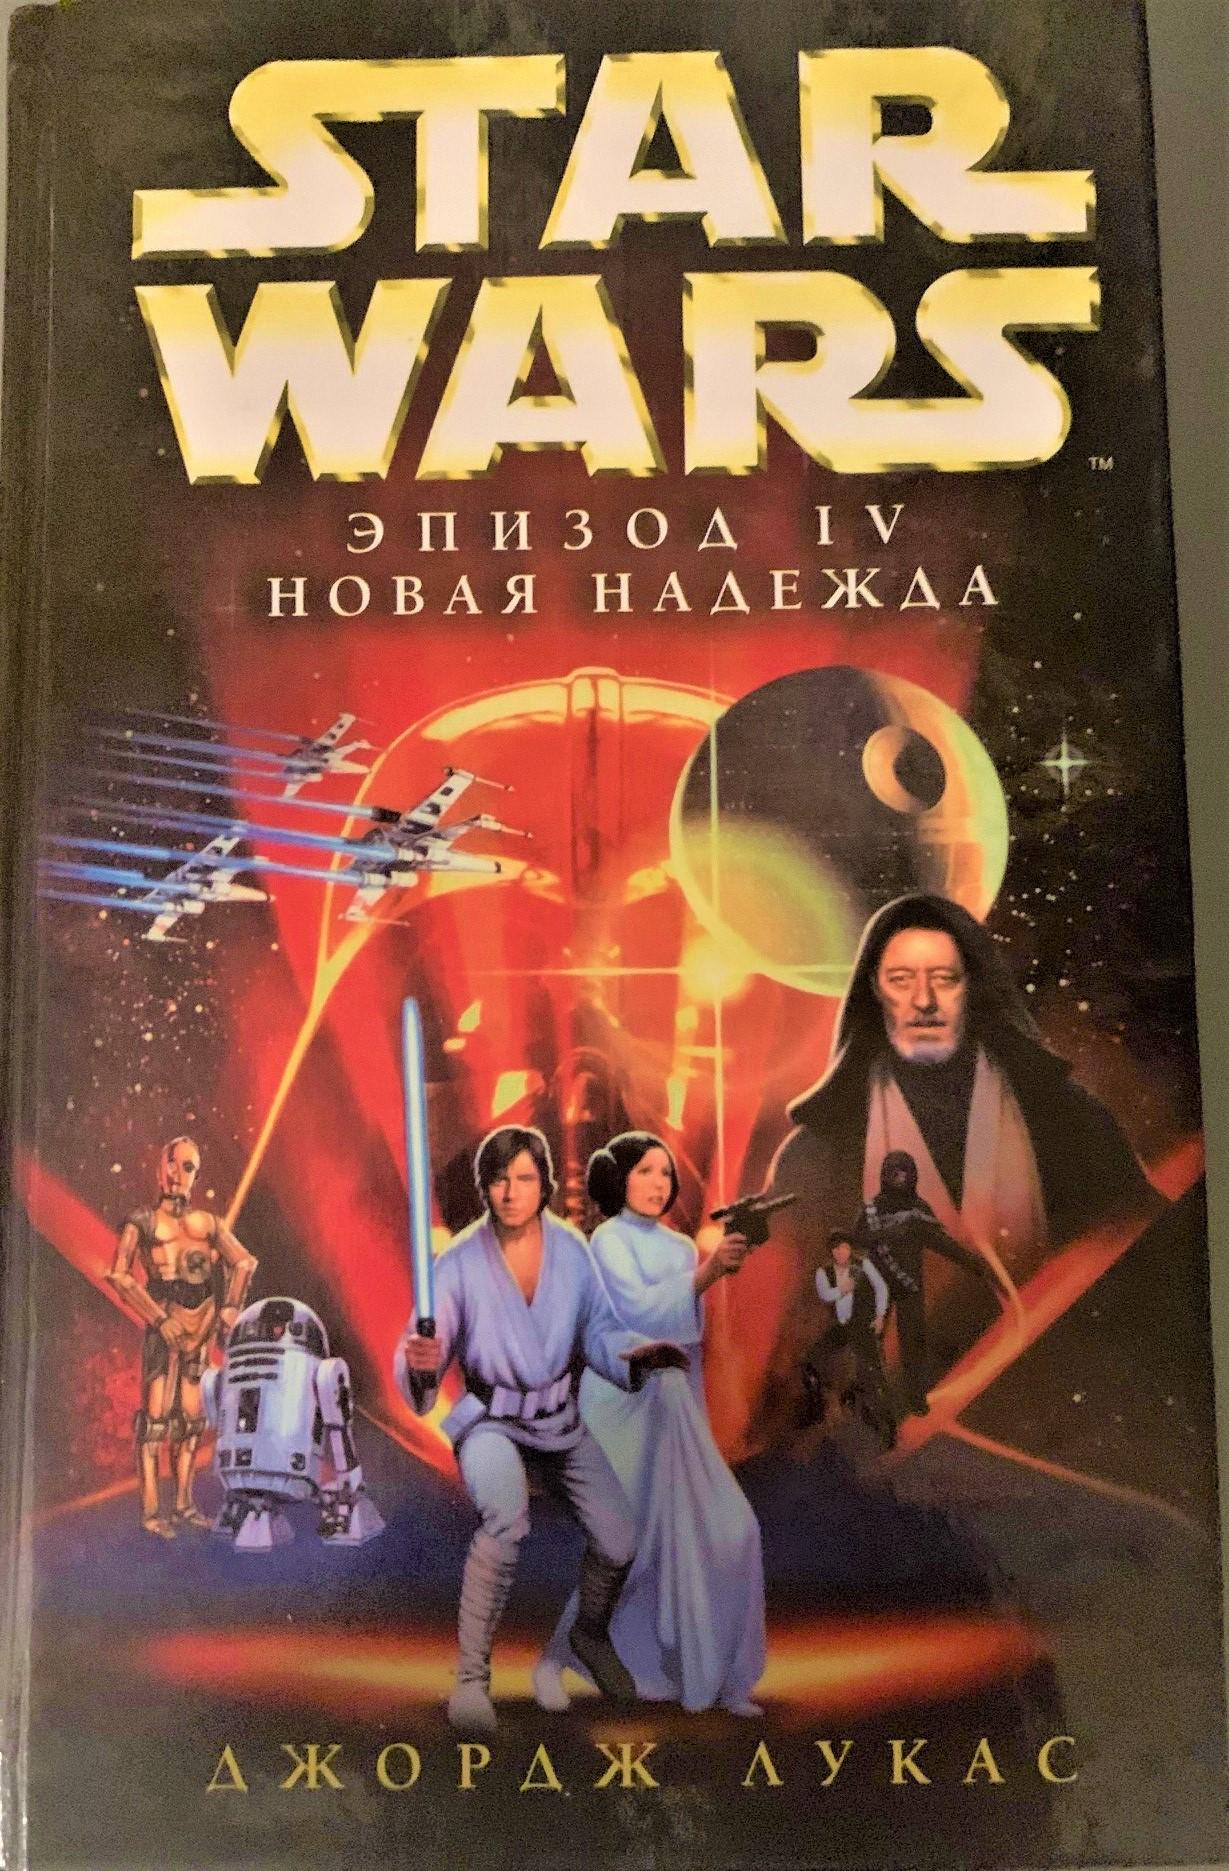 Star Wars: A New Hope (Russian)